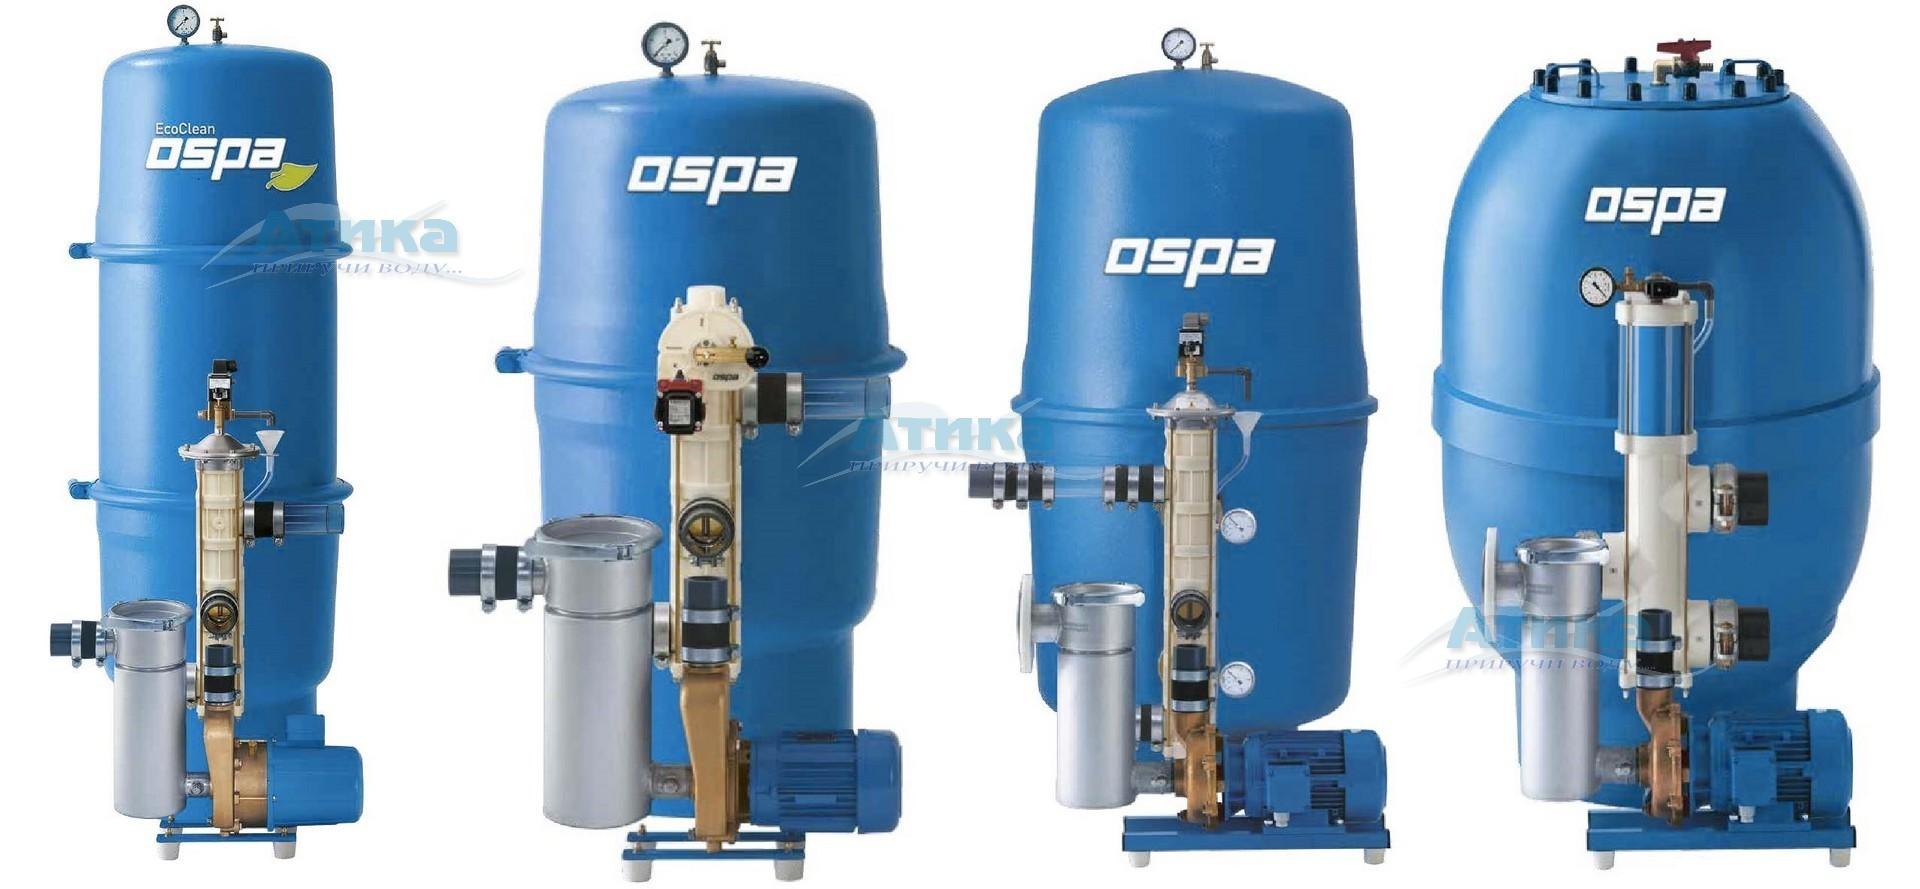 ospa-оборудование-для-бассейнов-атика-спб-санкт-петербург-питер